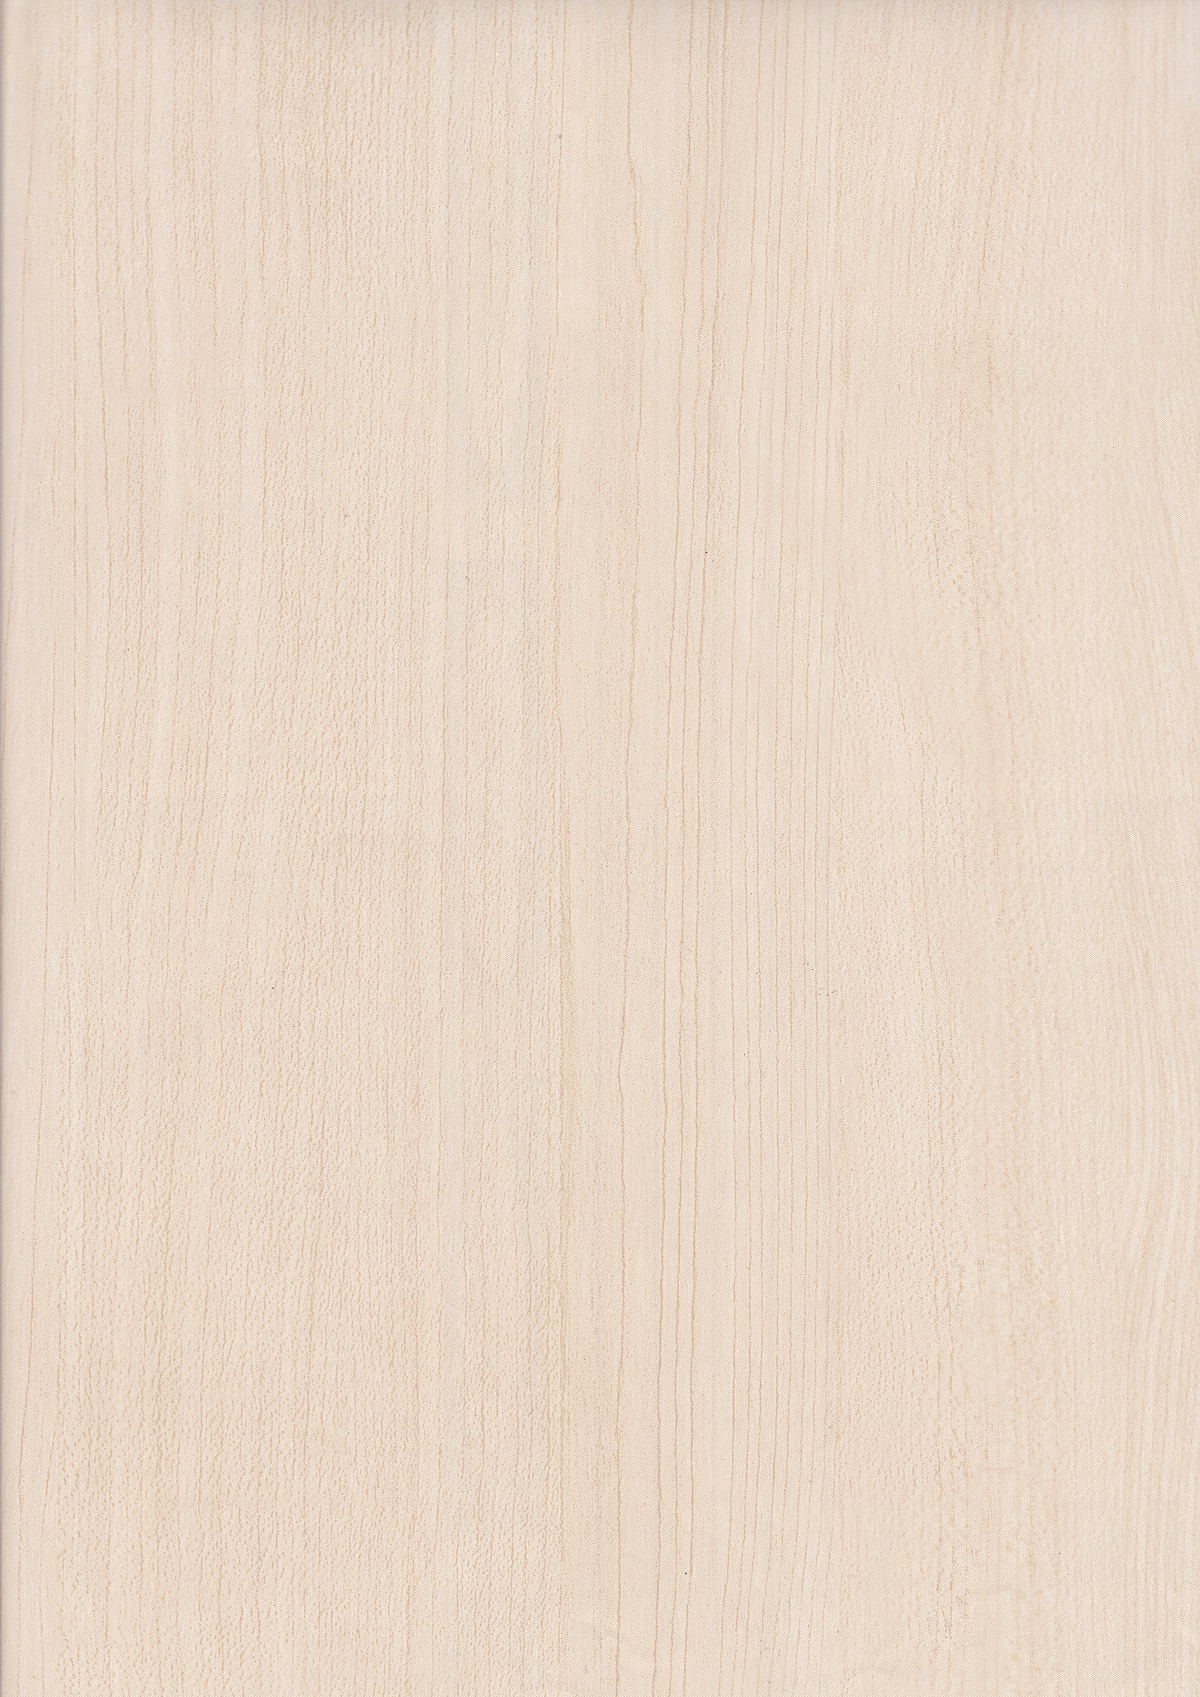 Indexbild 23 - Tapete / Folie selbstklebend 10 Meter Rolle Möbelfolie Klebefolie Wandfolie